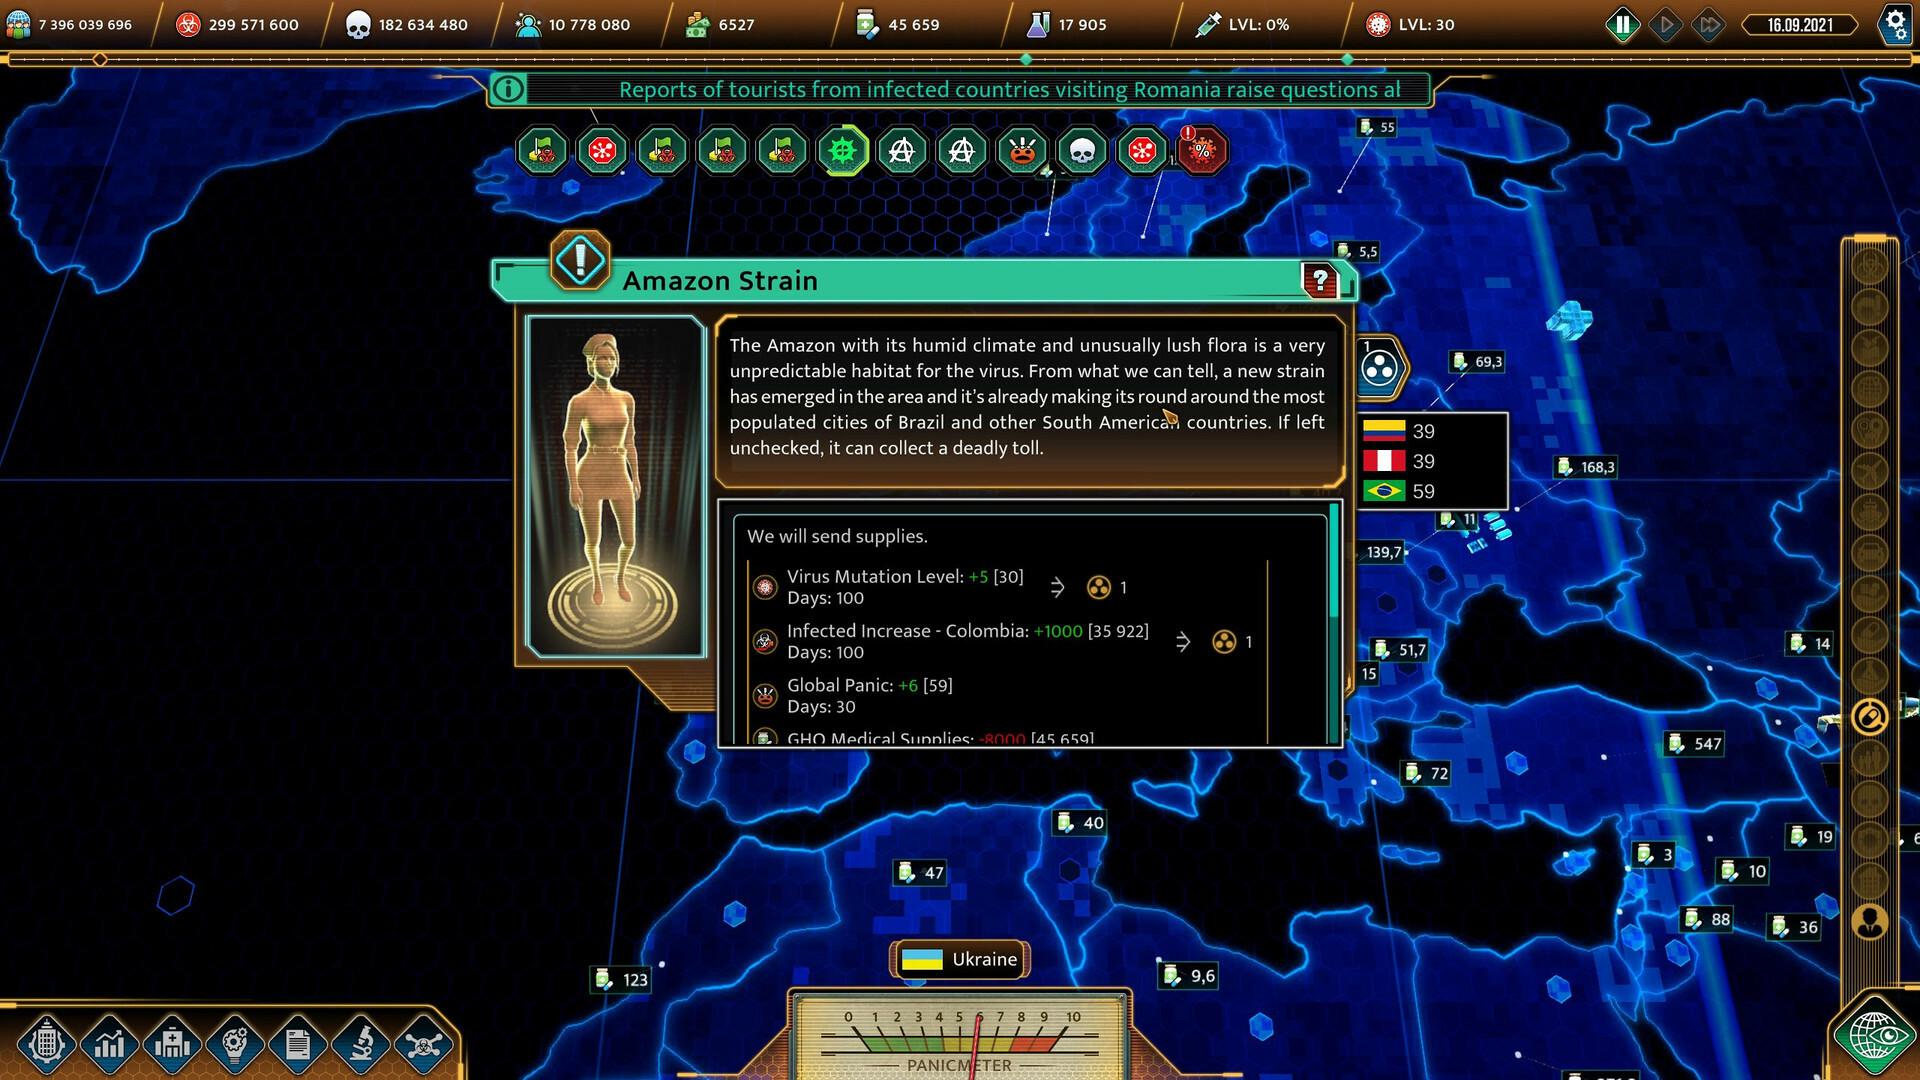 COVID: The Outbreak screenshot 1